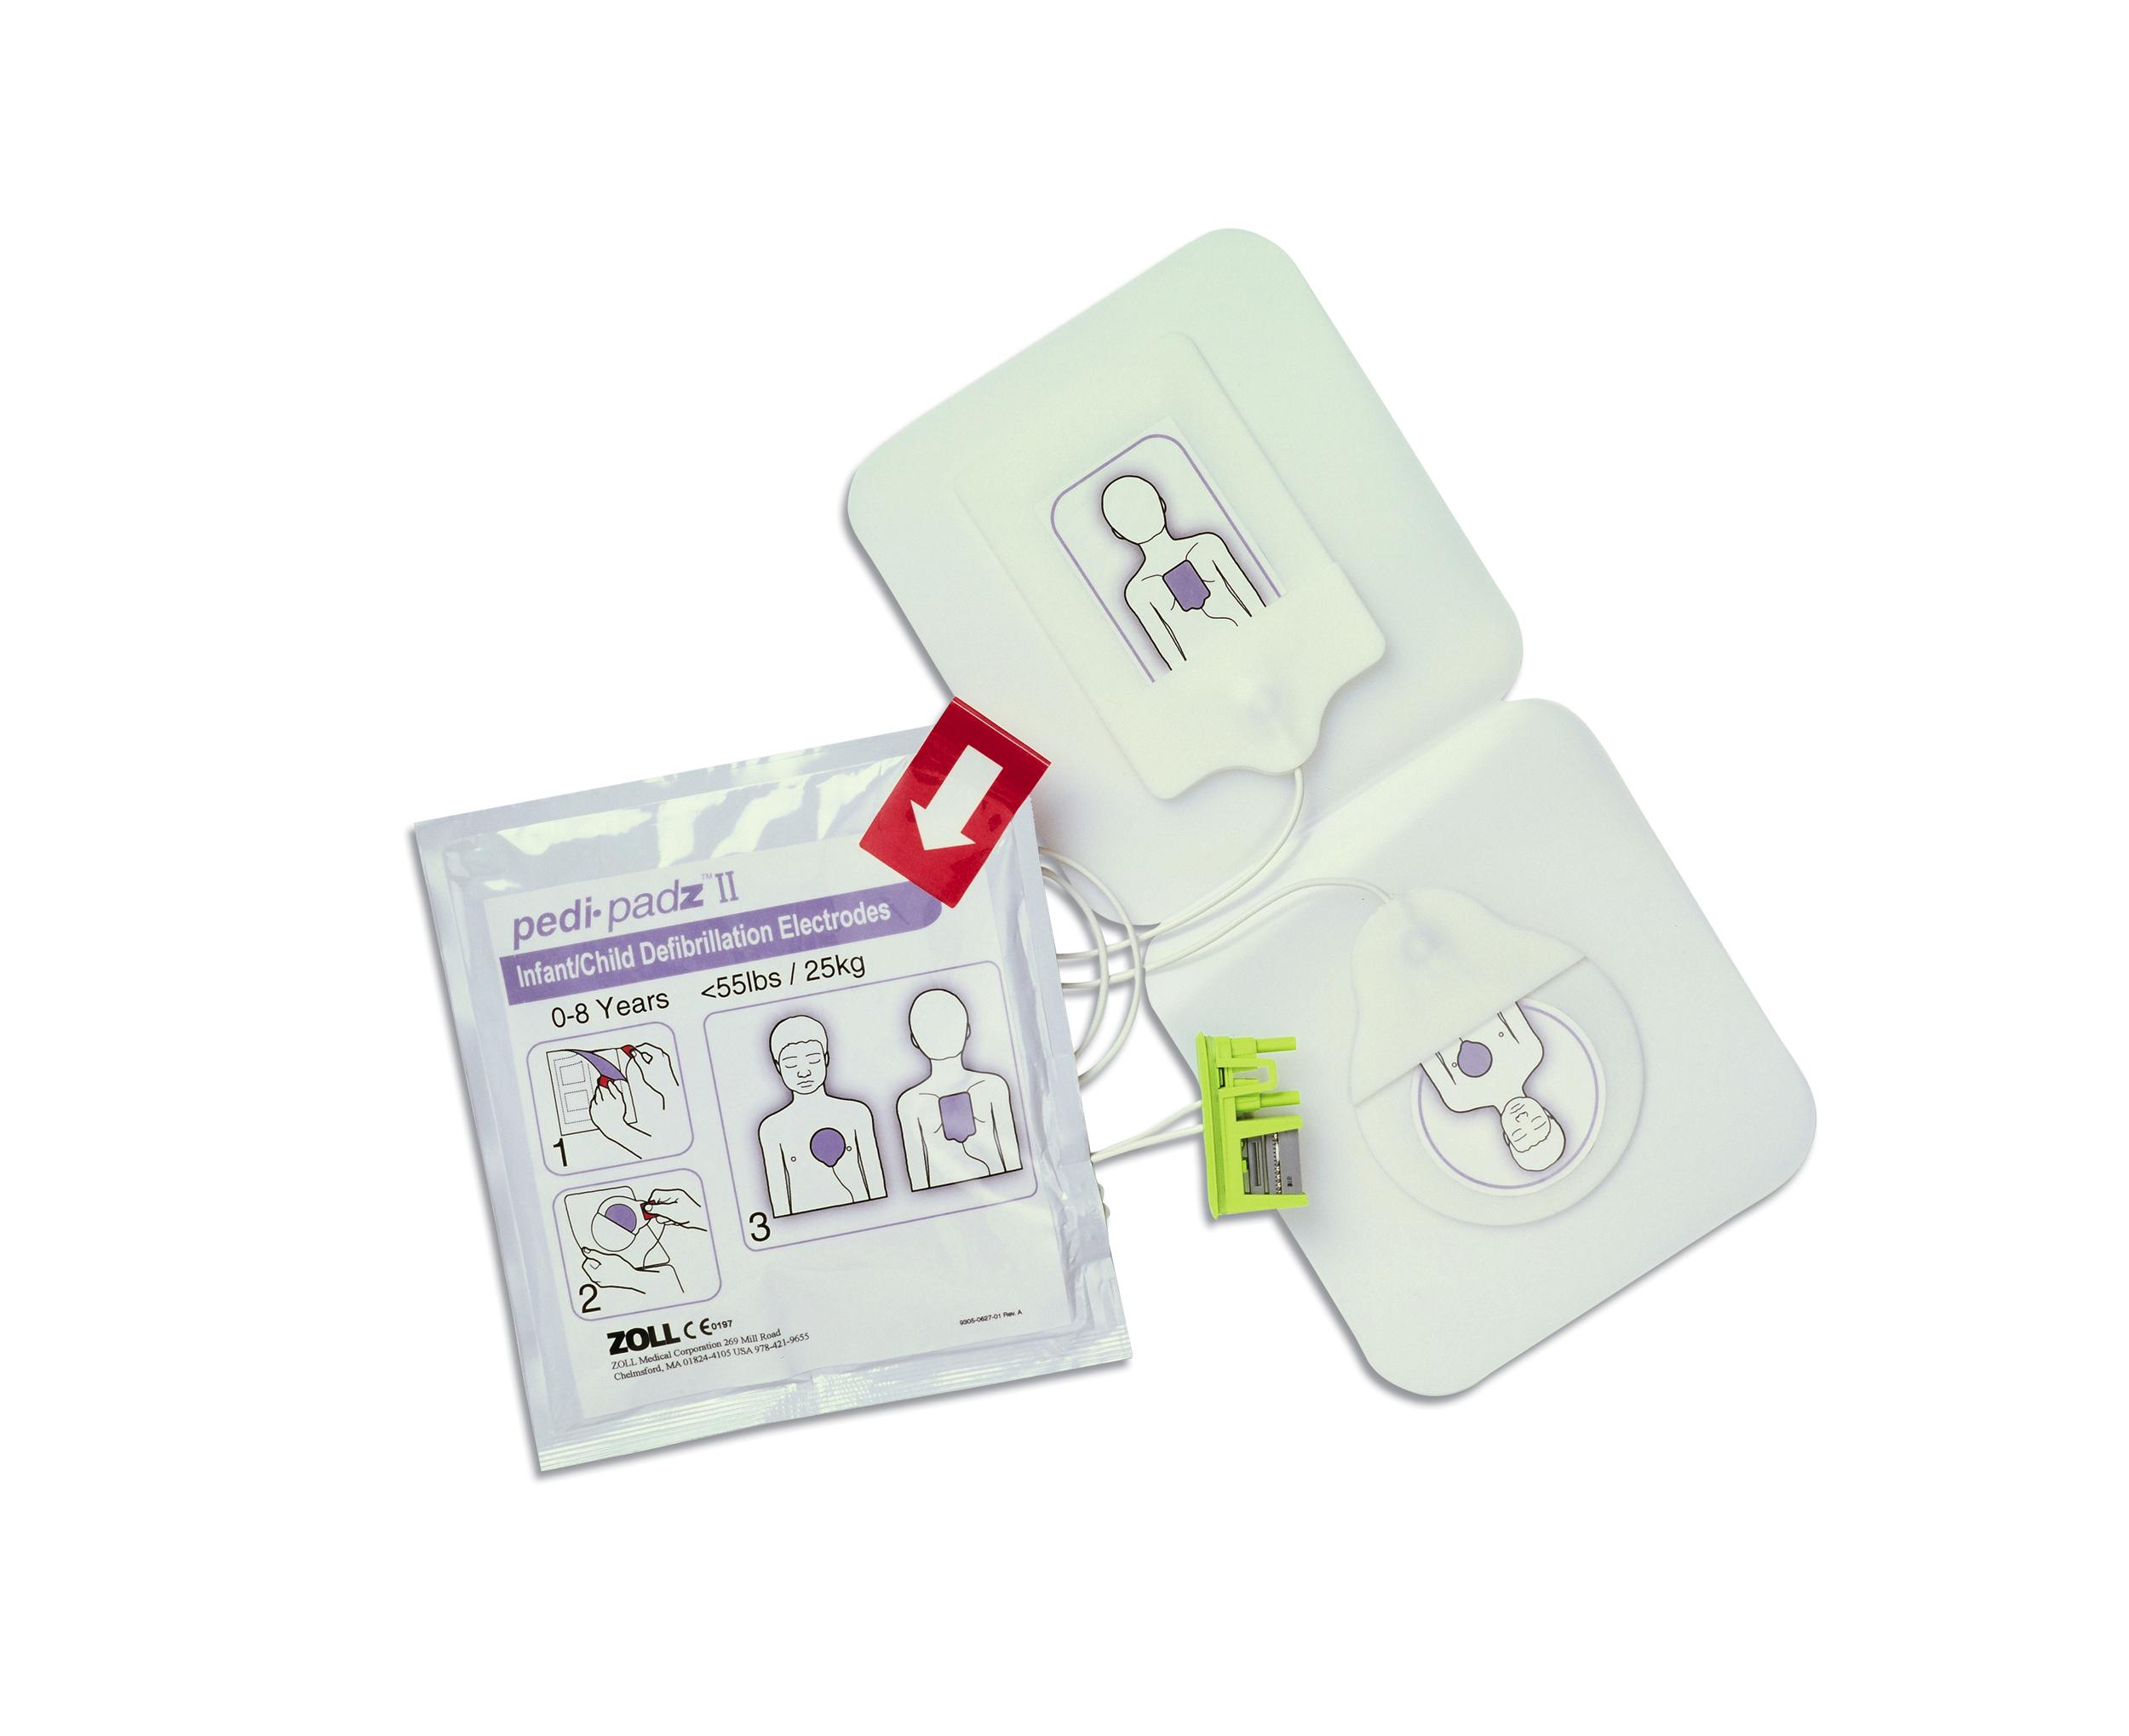 pedi padz II Pädiatrische Elektrode (Kinder)